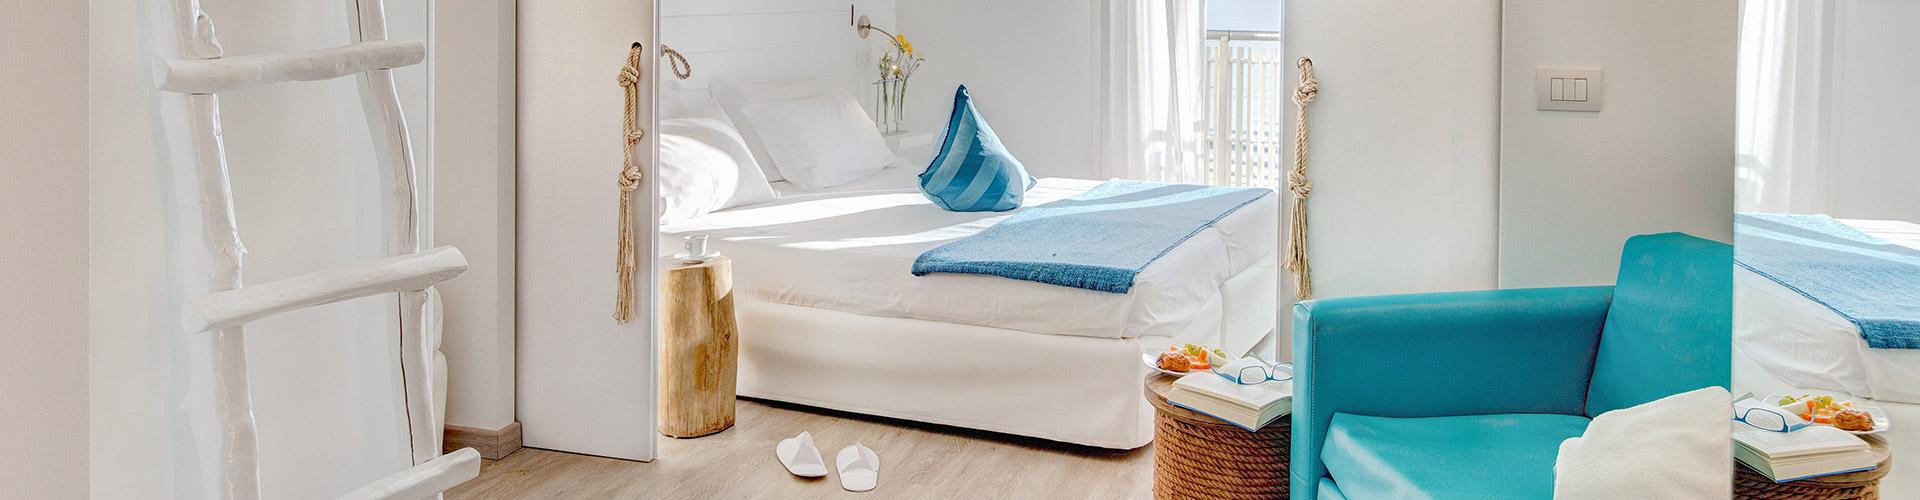 hotel_solemare2